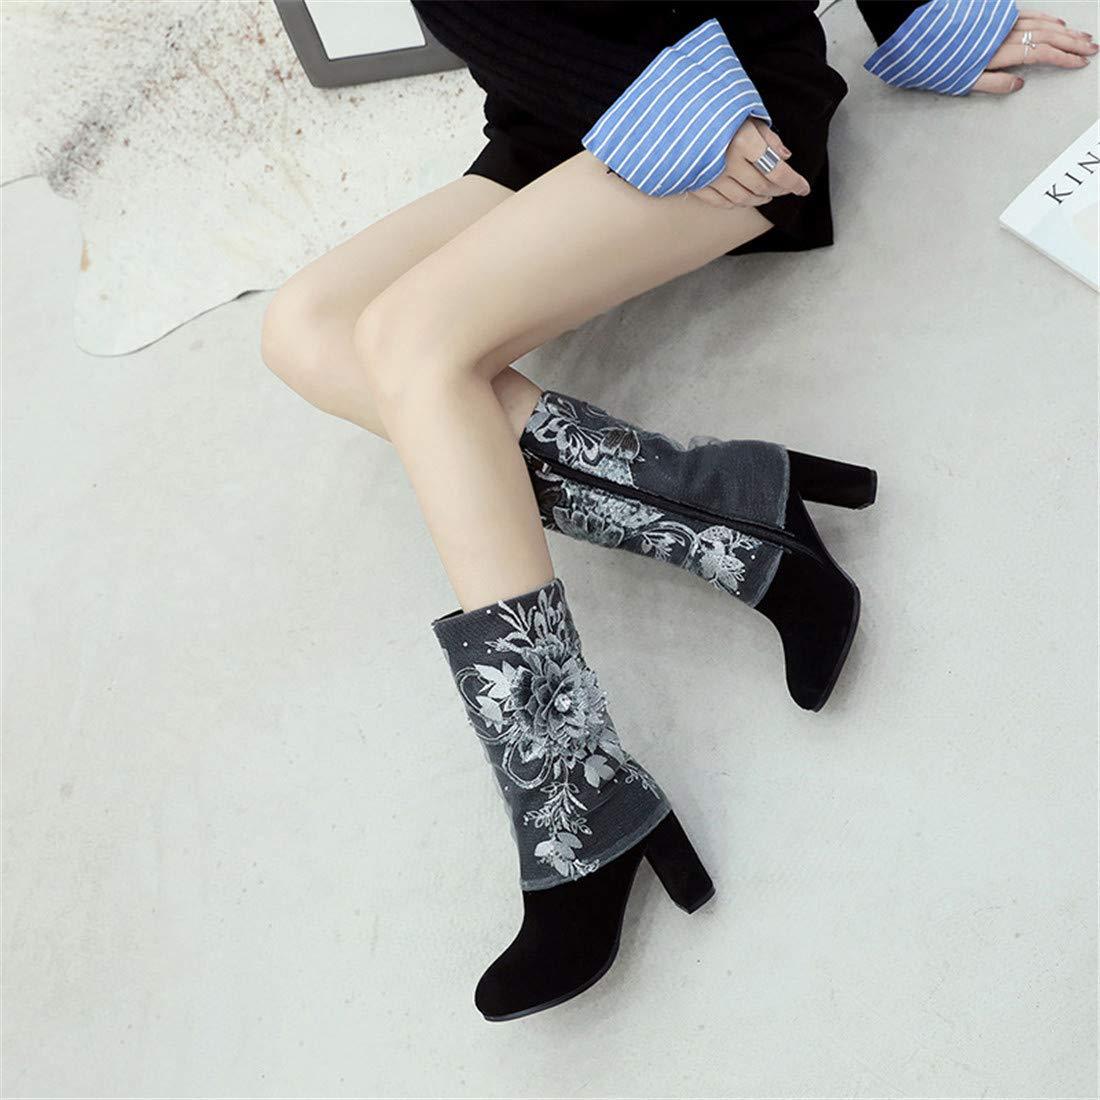 Stiefel & Stiefeletten, Stiefeletten mit Zentralrohr    Wilde Mode Damen Lederstiefel in der Tube  große Damenstiefel 5b99e6